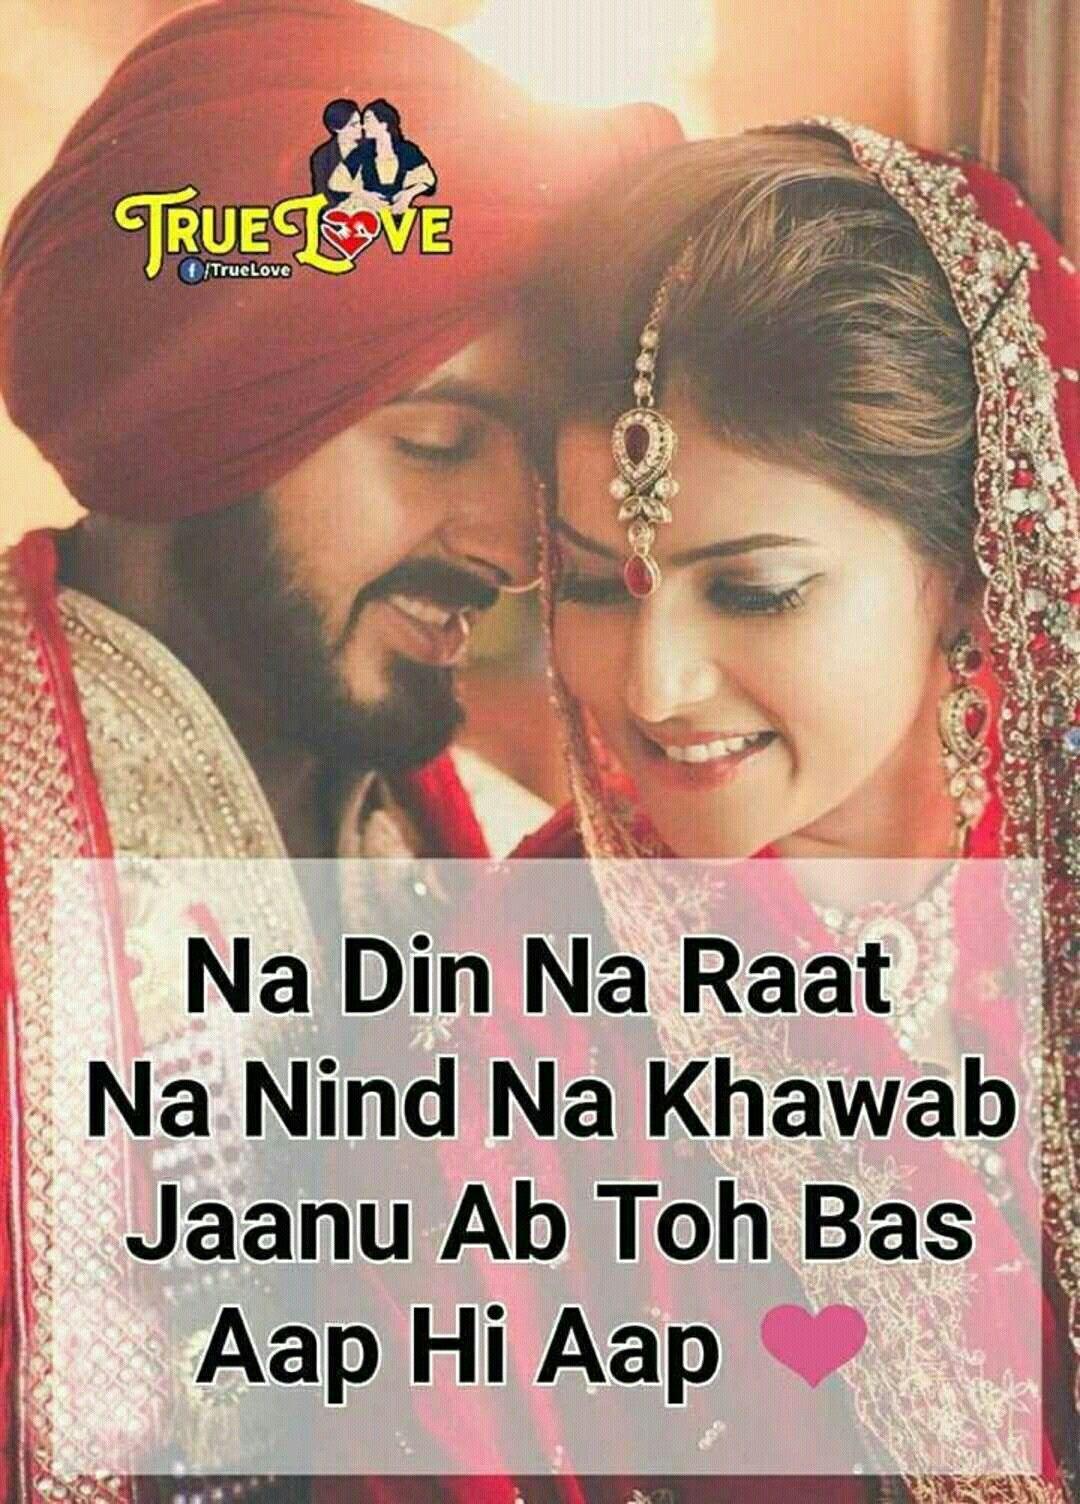 True love shayari pic in hindi